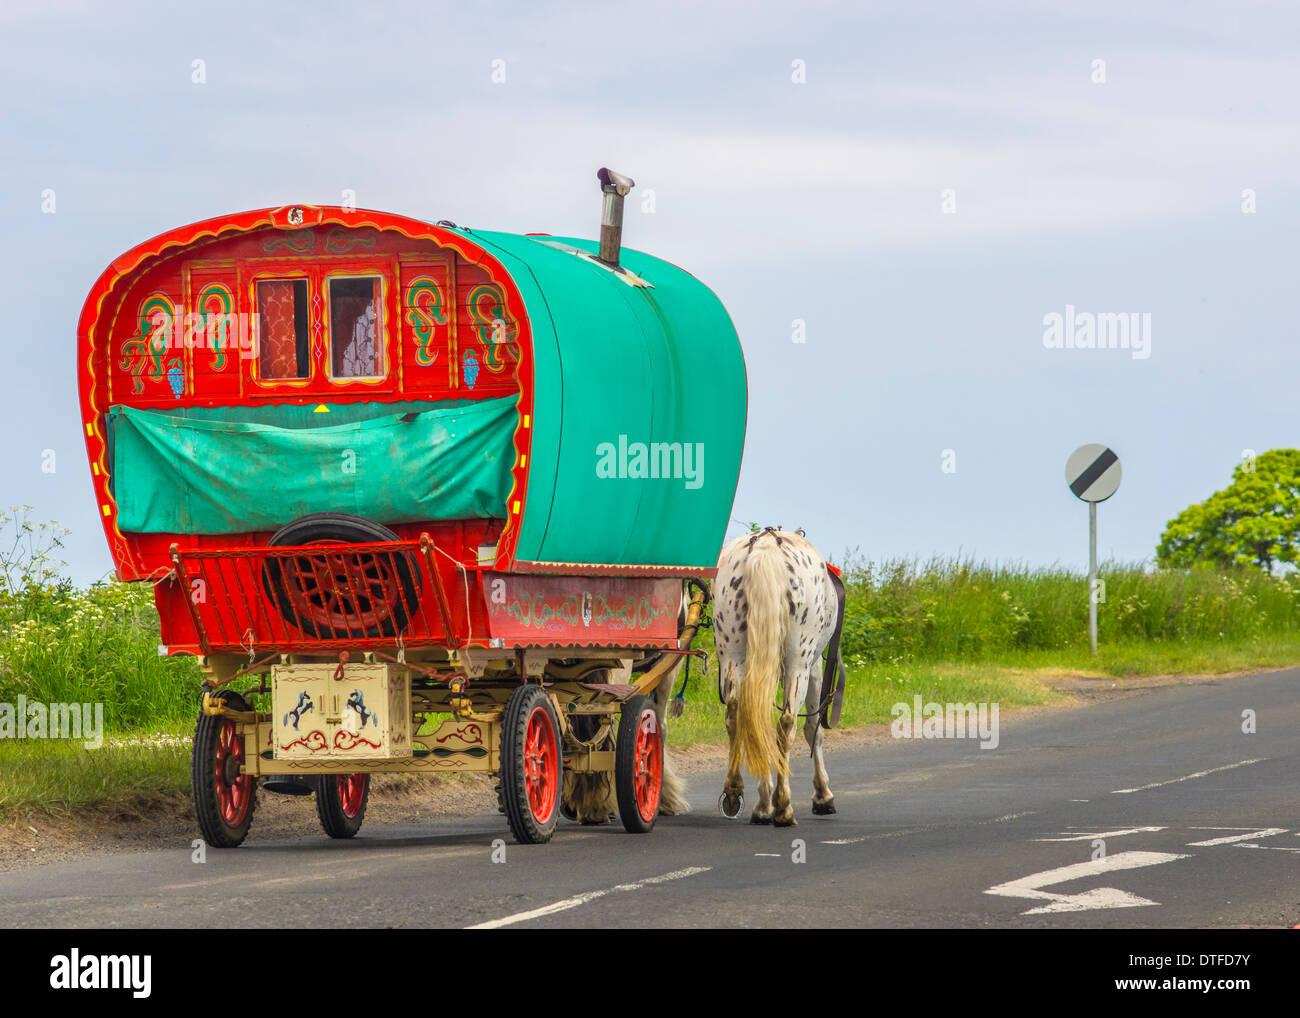 Old Traditional Gypsy Caravan - Stock Image